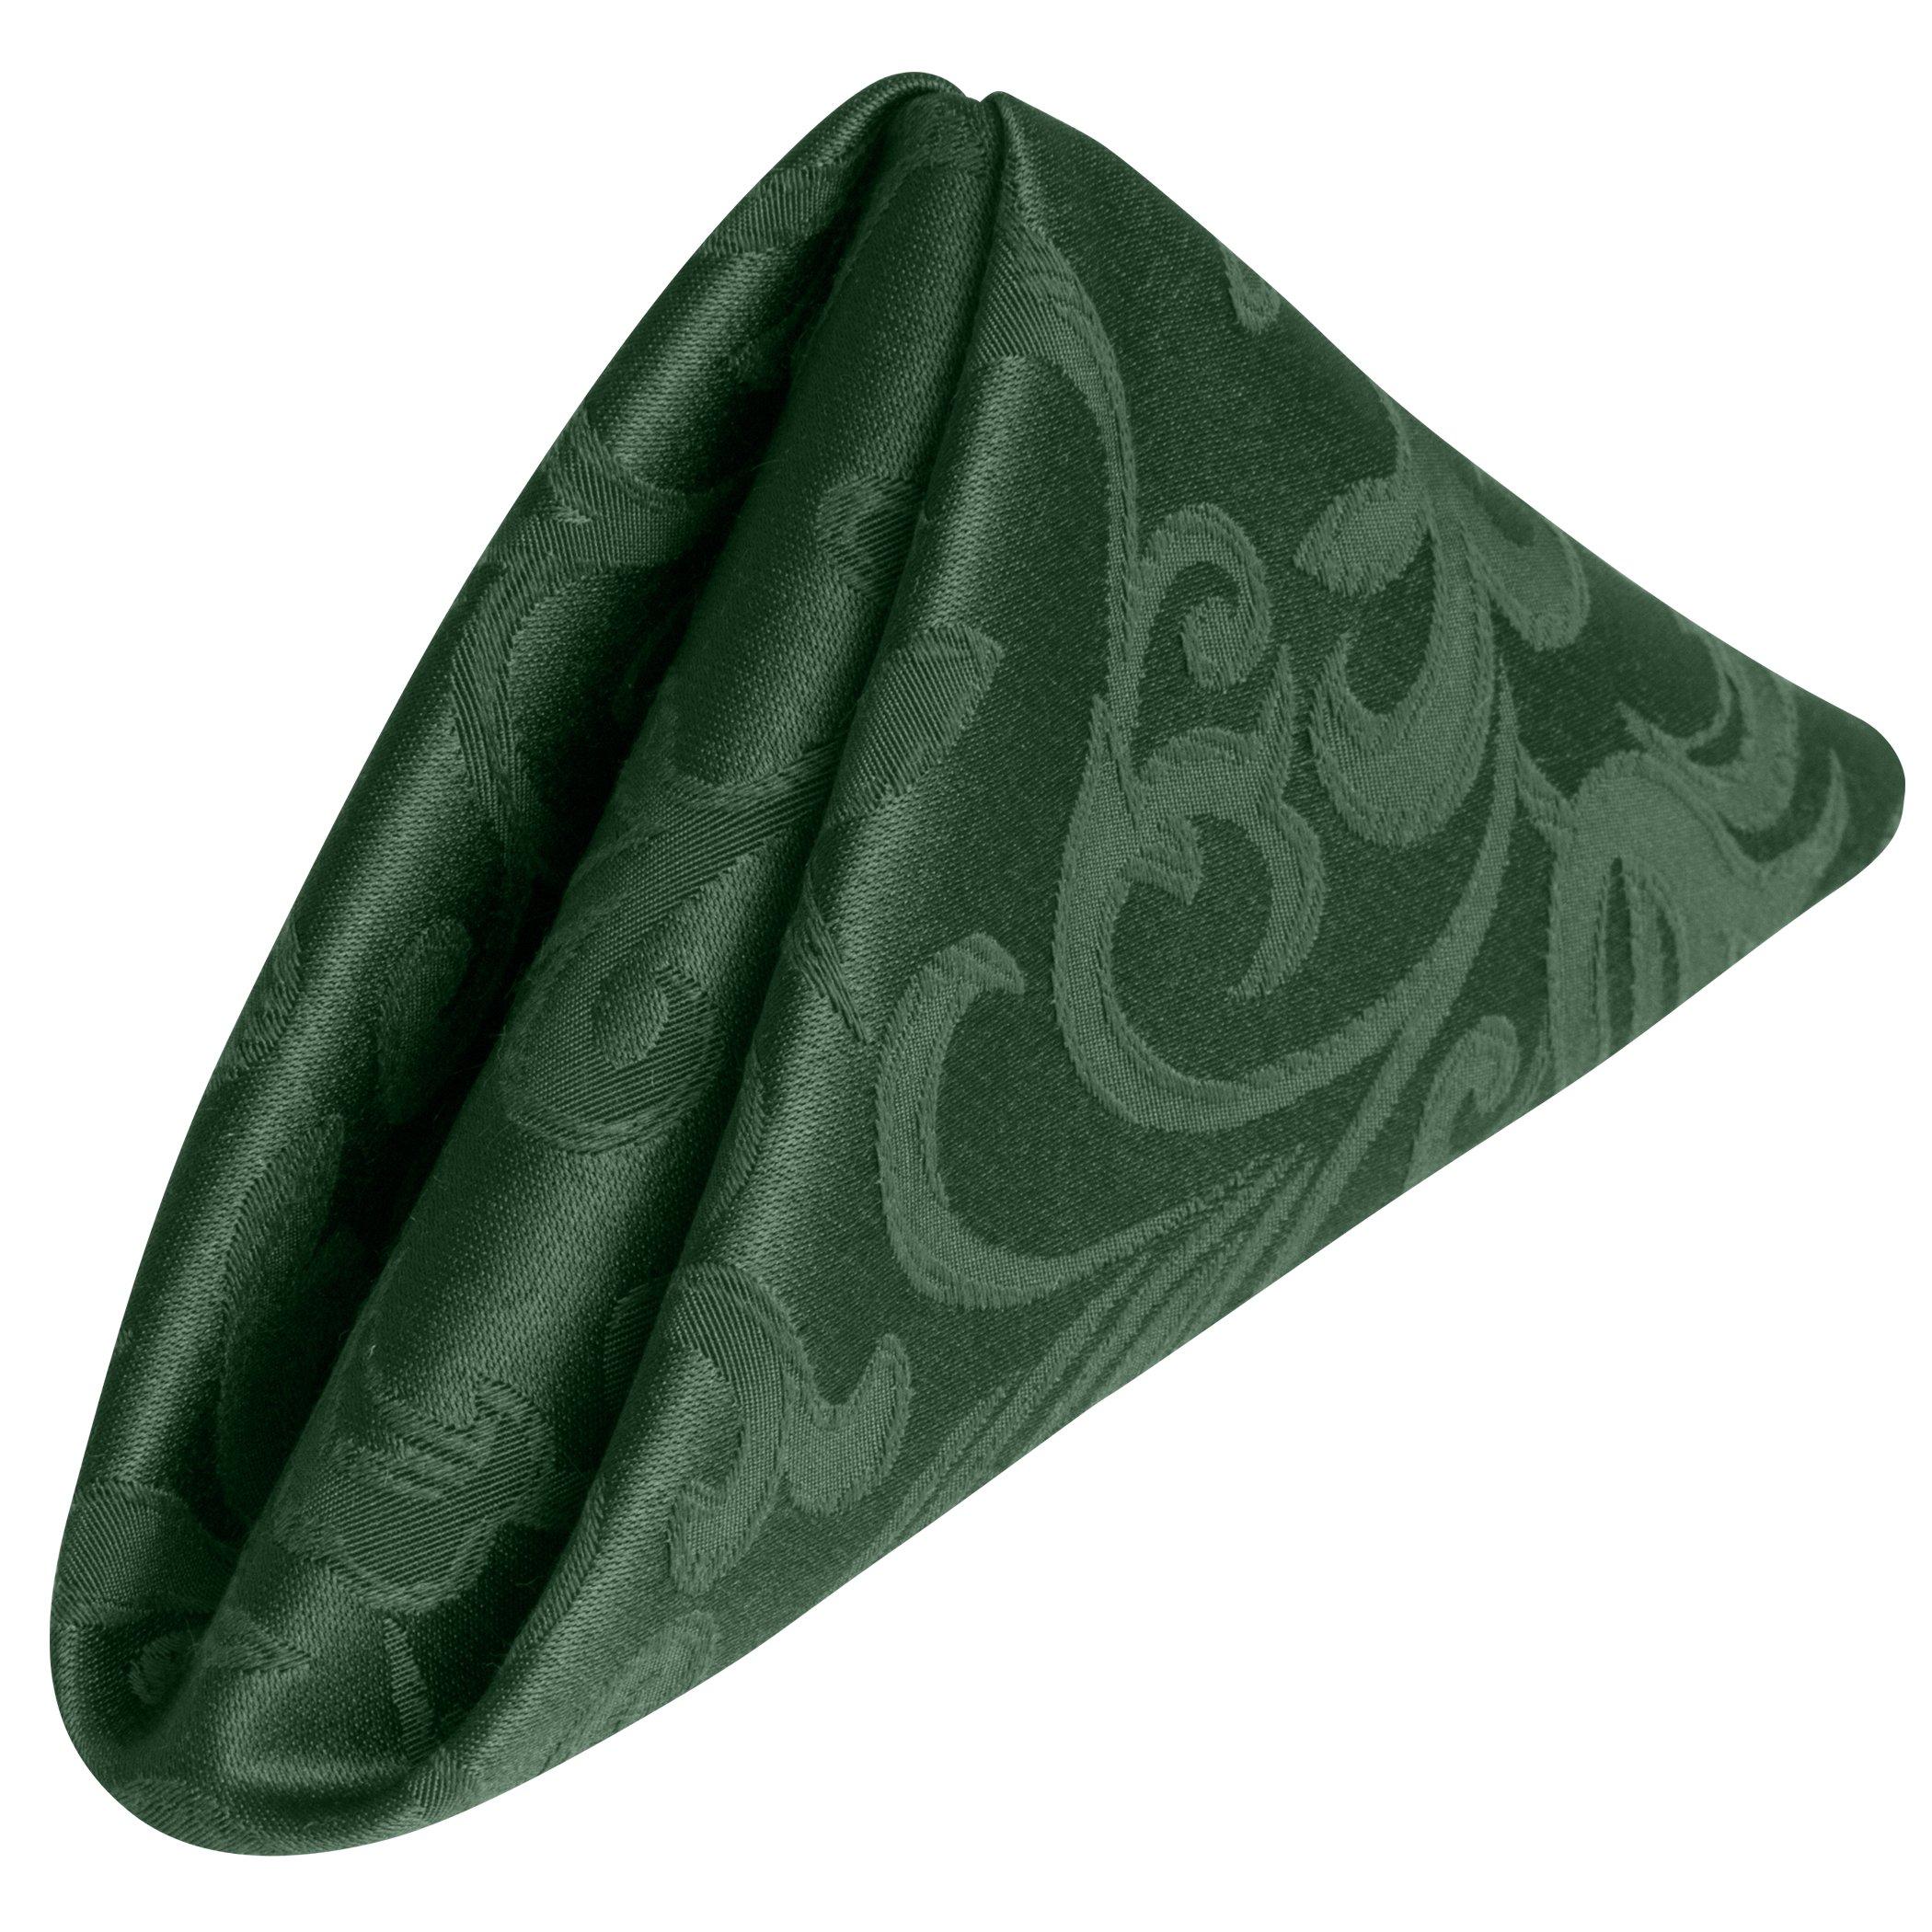 Ultimate Textile (10 Dozen) Somerset 17 x 17-Inch Damask Cloth Napkins- Jacquard Weave Scroll Design, Hunter Green